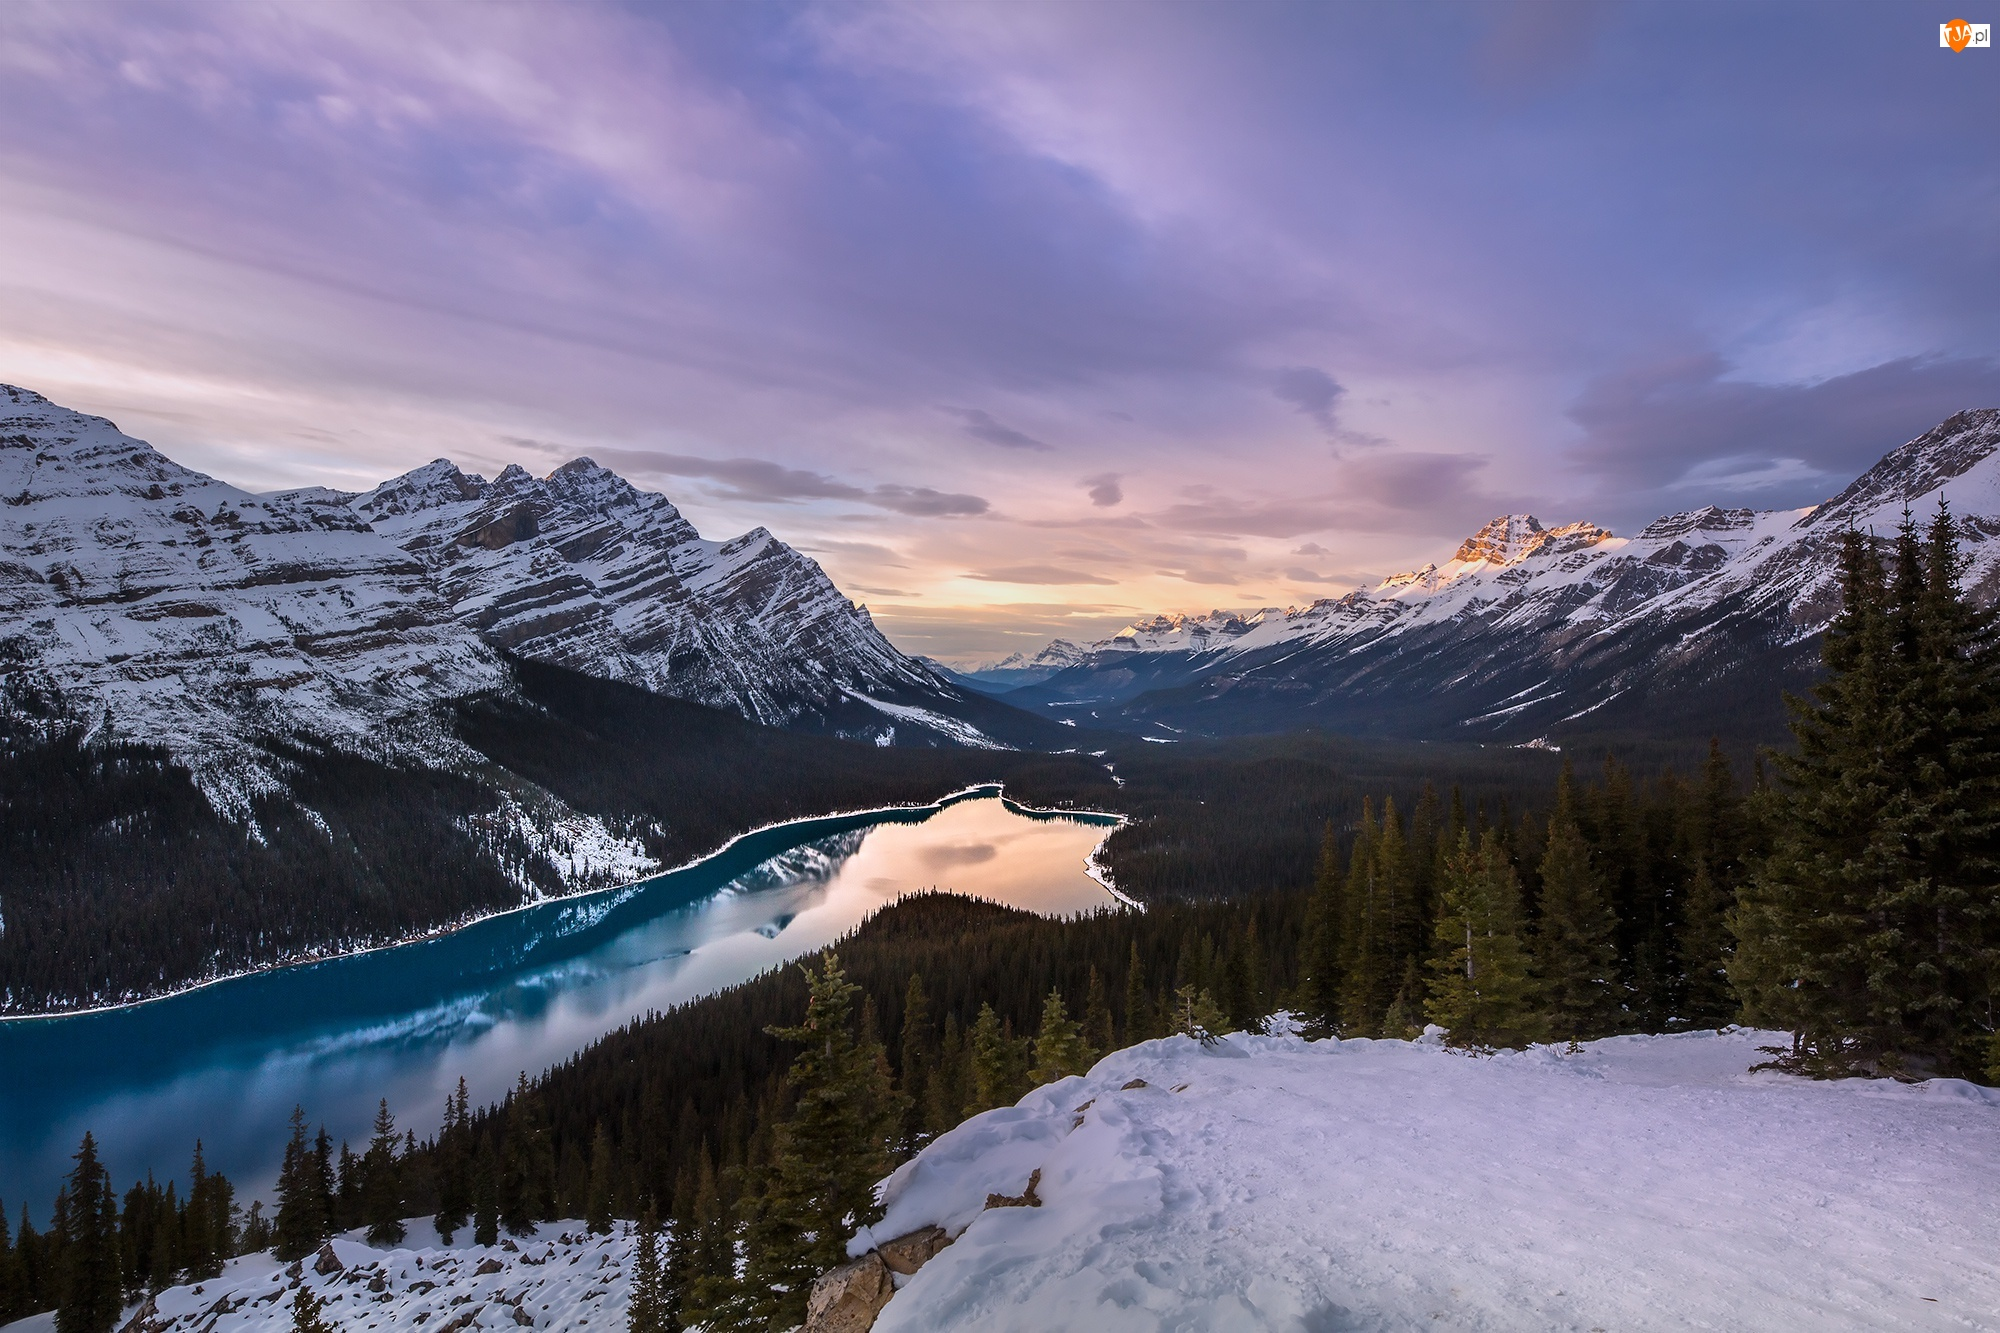 Park Narodowy Banff, Kanada, Góry Canadian Rockies, Zima, Jezioro Peyto Lake, Lasy